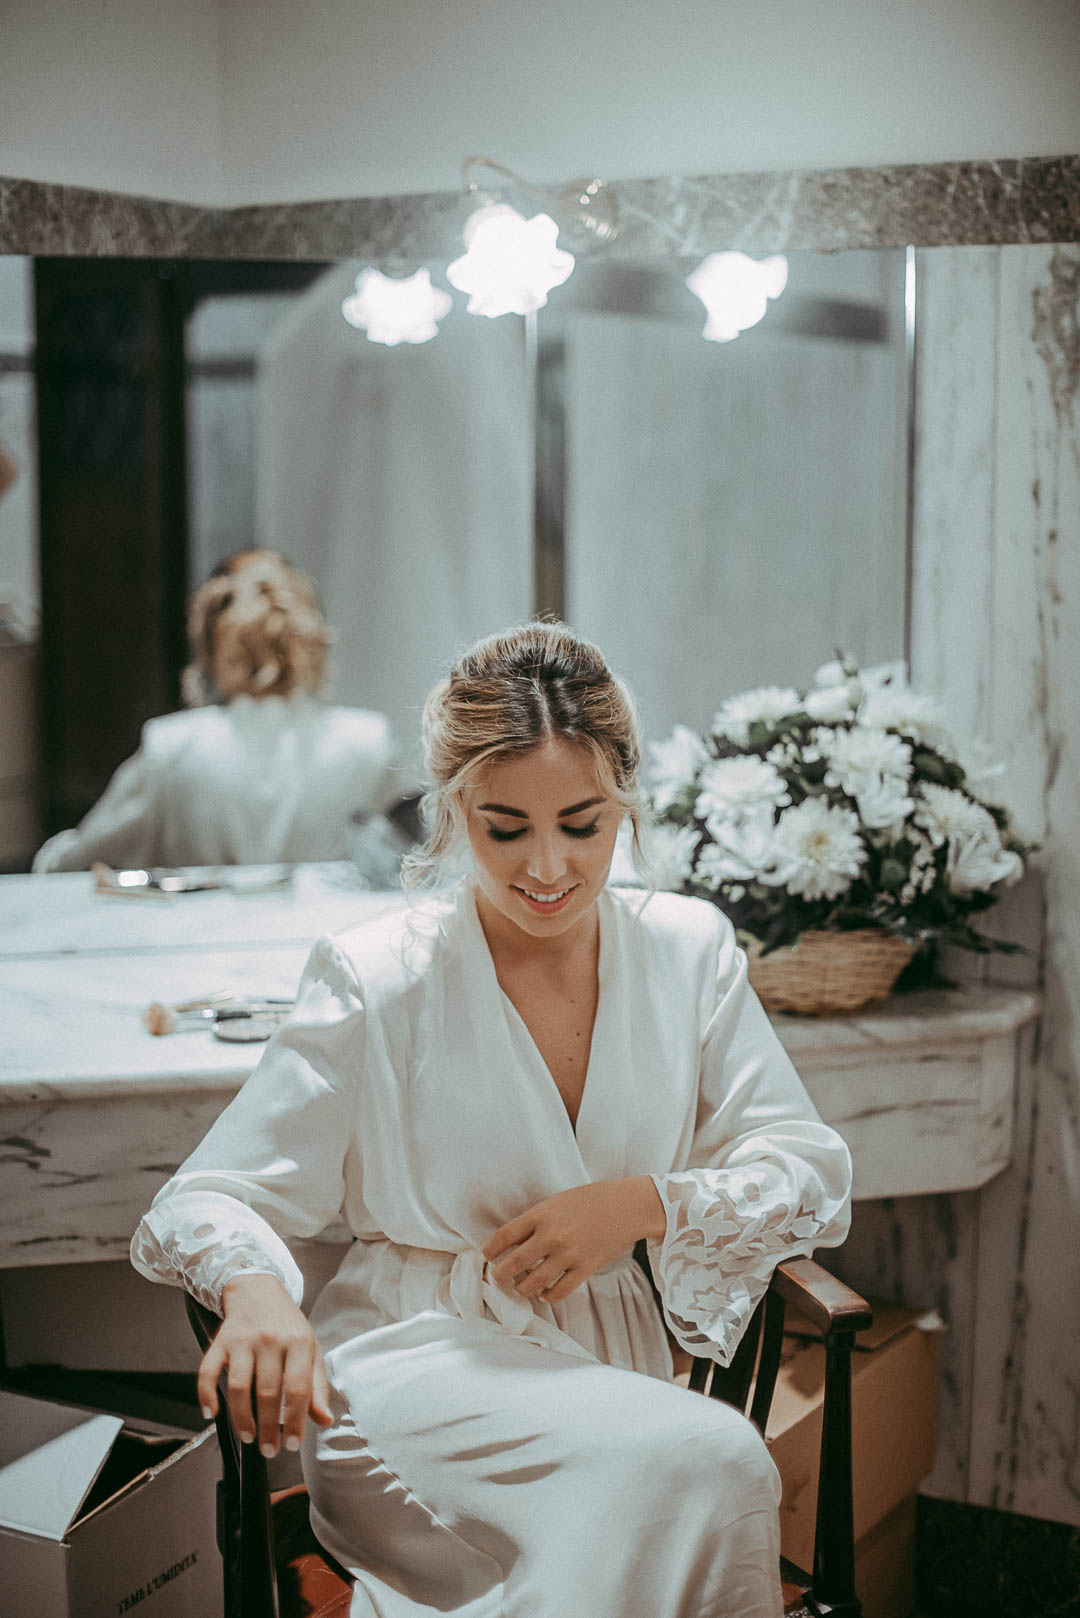 vivianeizzo-spazio46-wedding-photographer-destination-reportage-napoli-villacilento-9